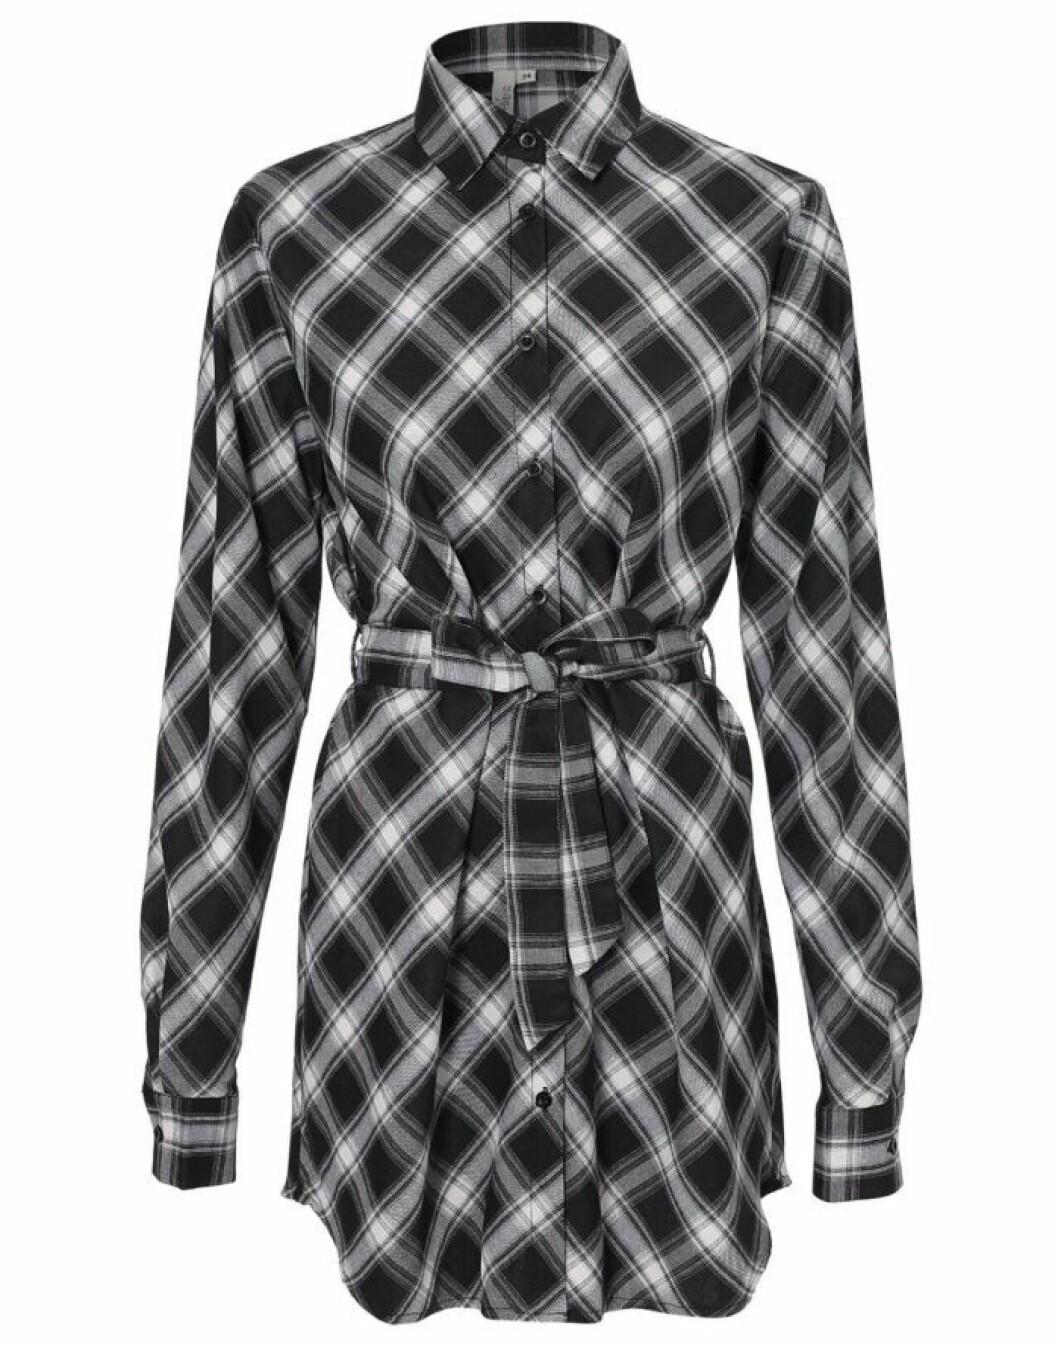 Rutig skjorta i oversize-modell